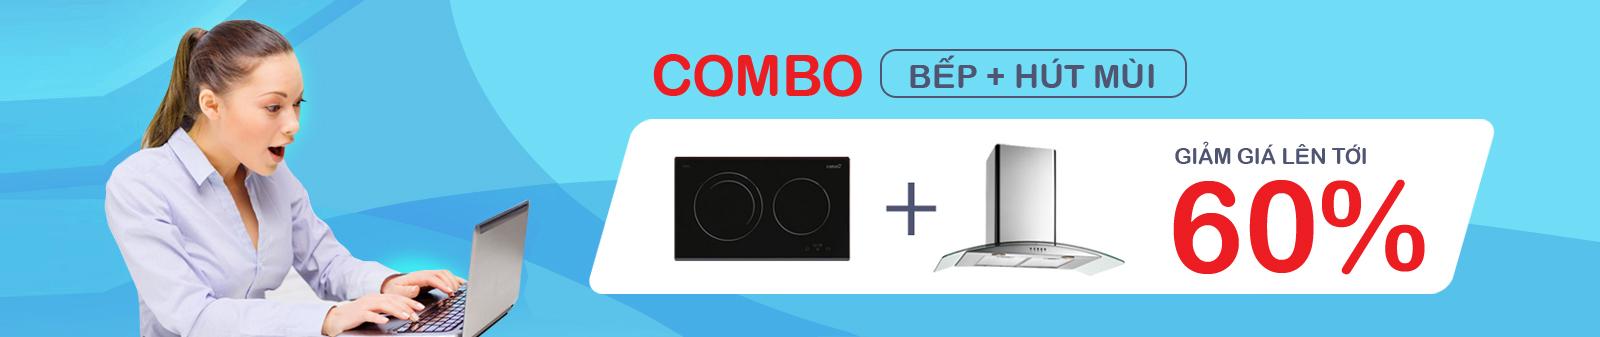 Banner slide khuyến mại combox bếp + hút